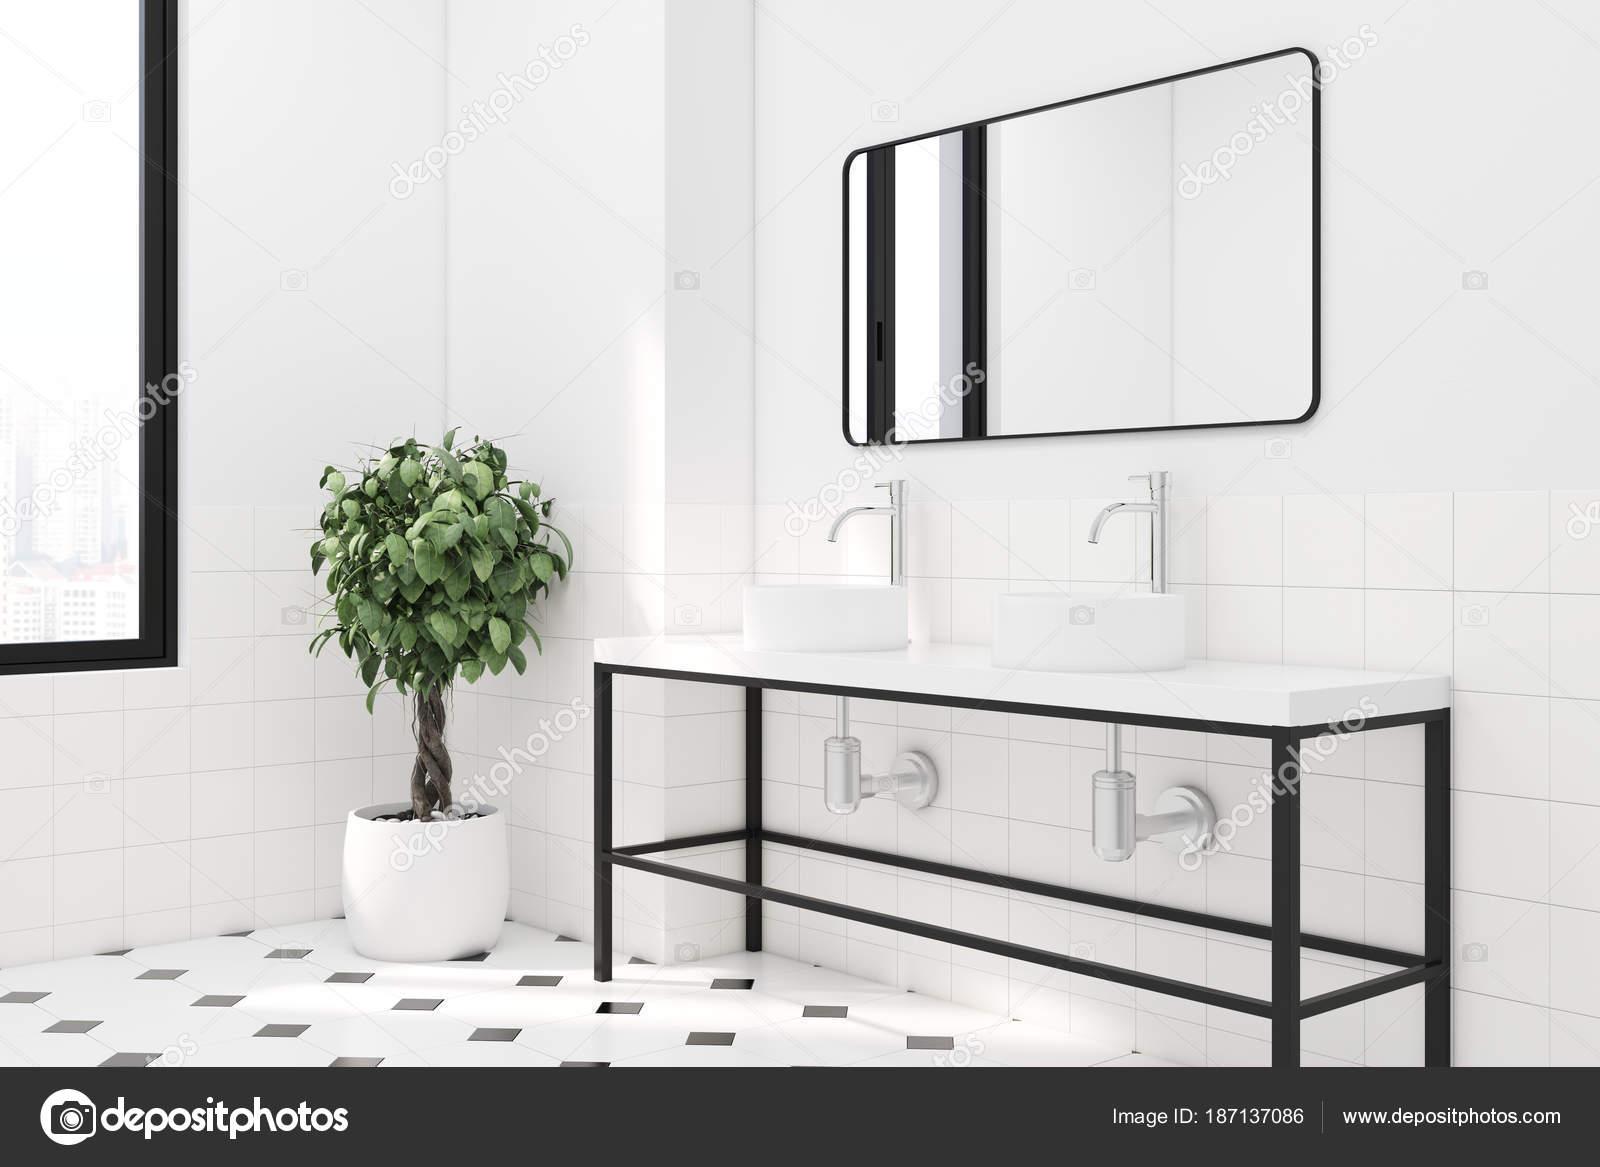 Rechthoekige Witte Wastafel : Wit betegelde badkamer dubbele wastafel zijaanzicht u stockfoto